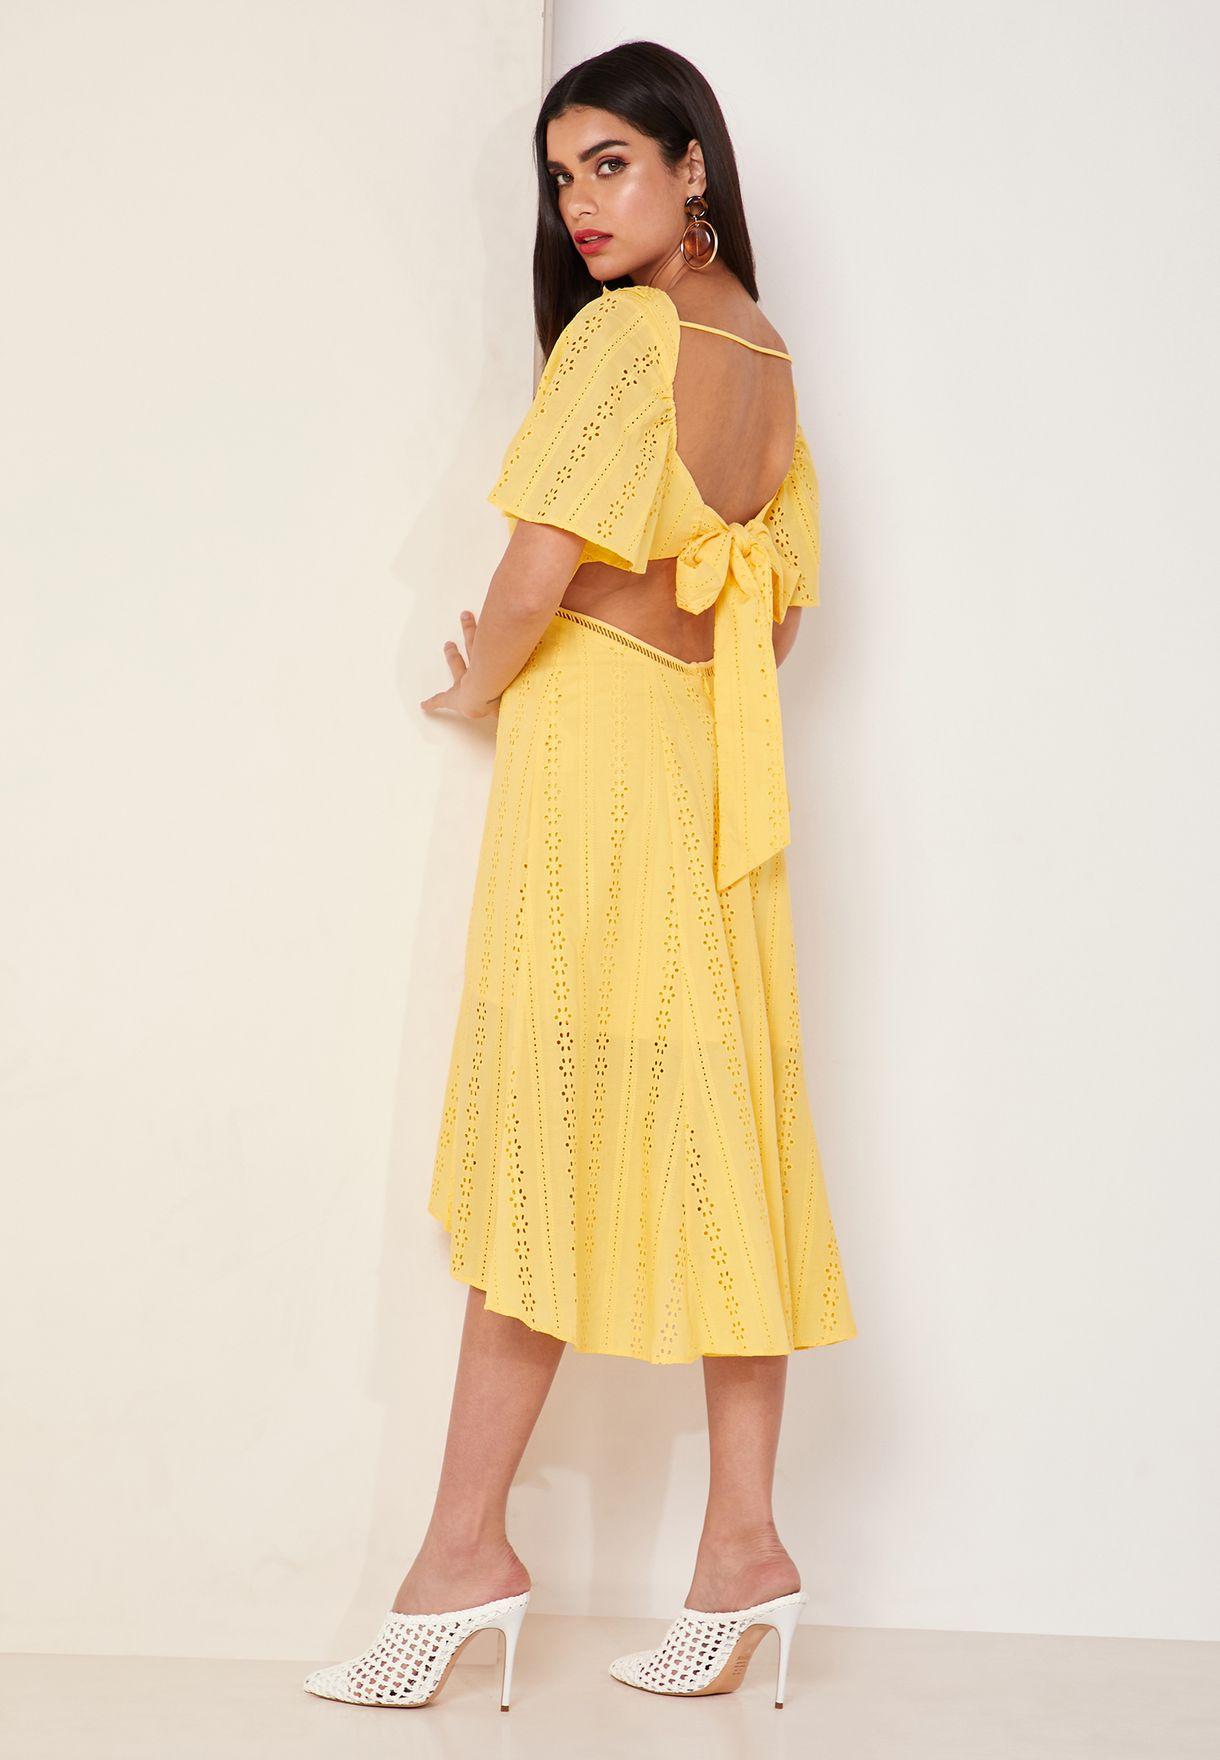 فستان بظهر عاري مزين بكشكش